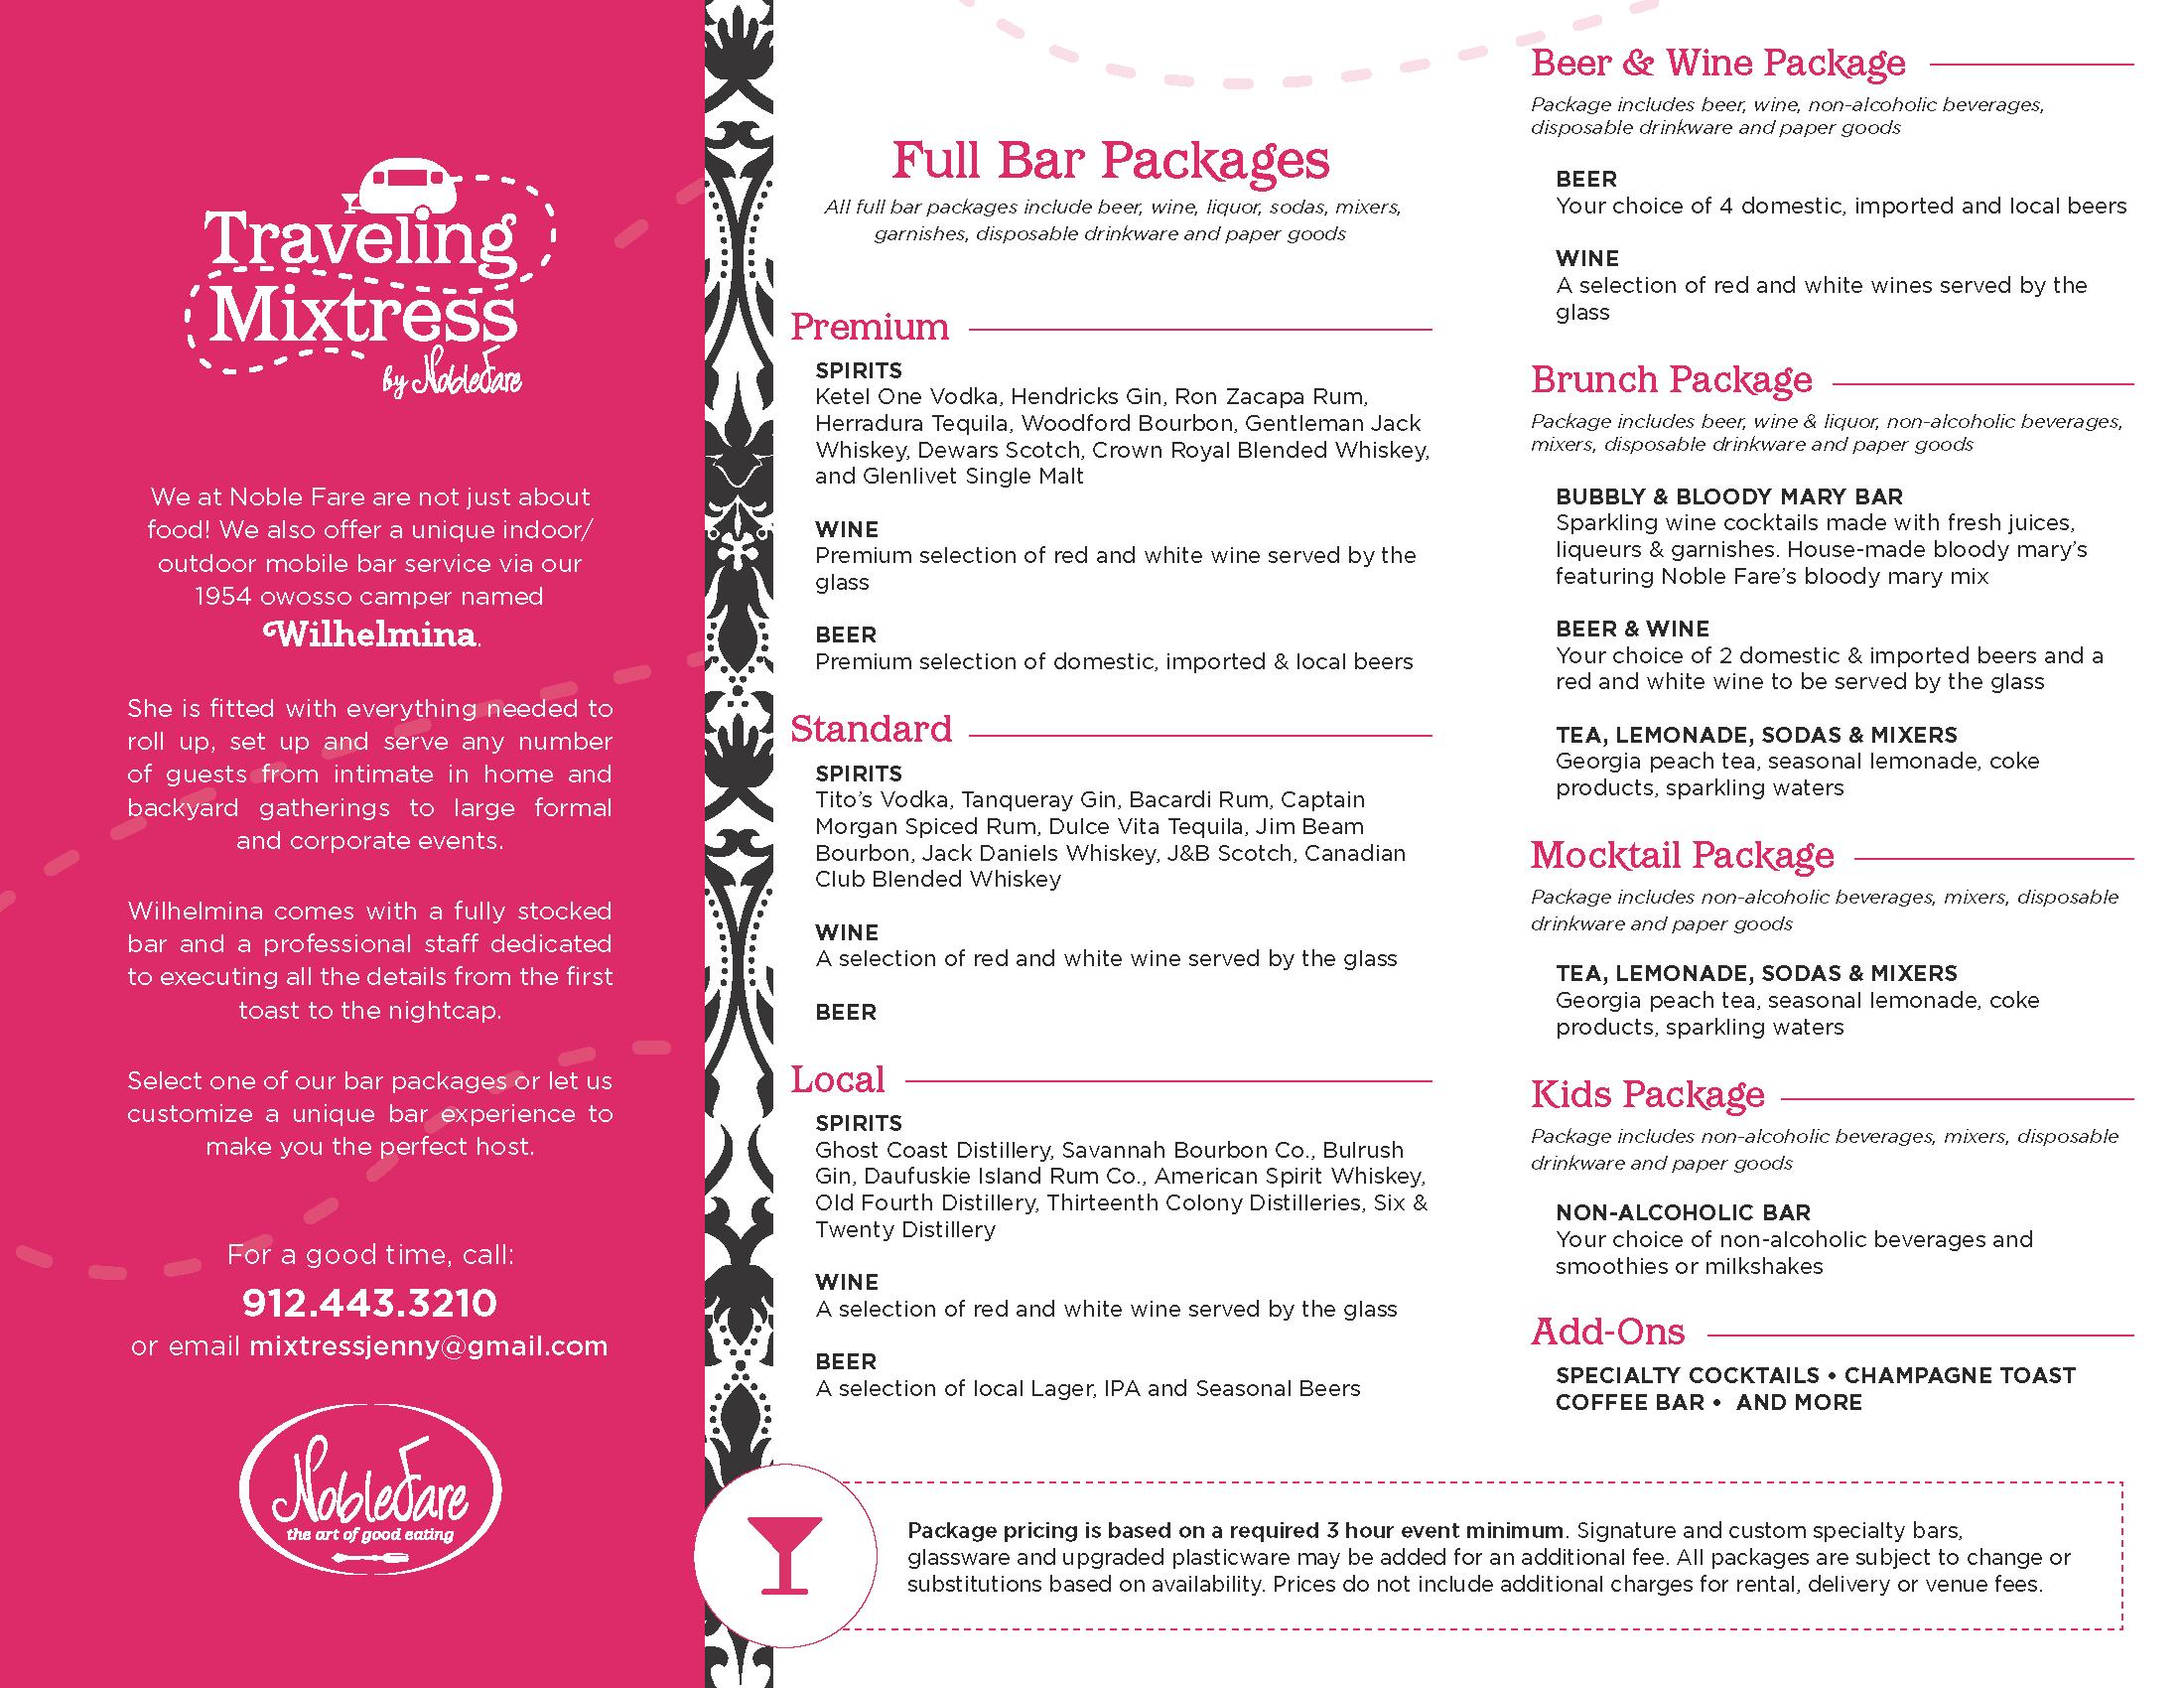 Noble Fare Catering - Traveling Mixtress Menu Brochure